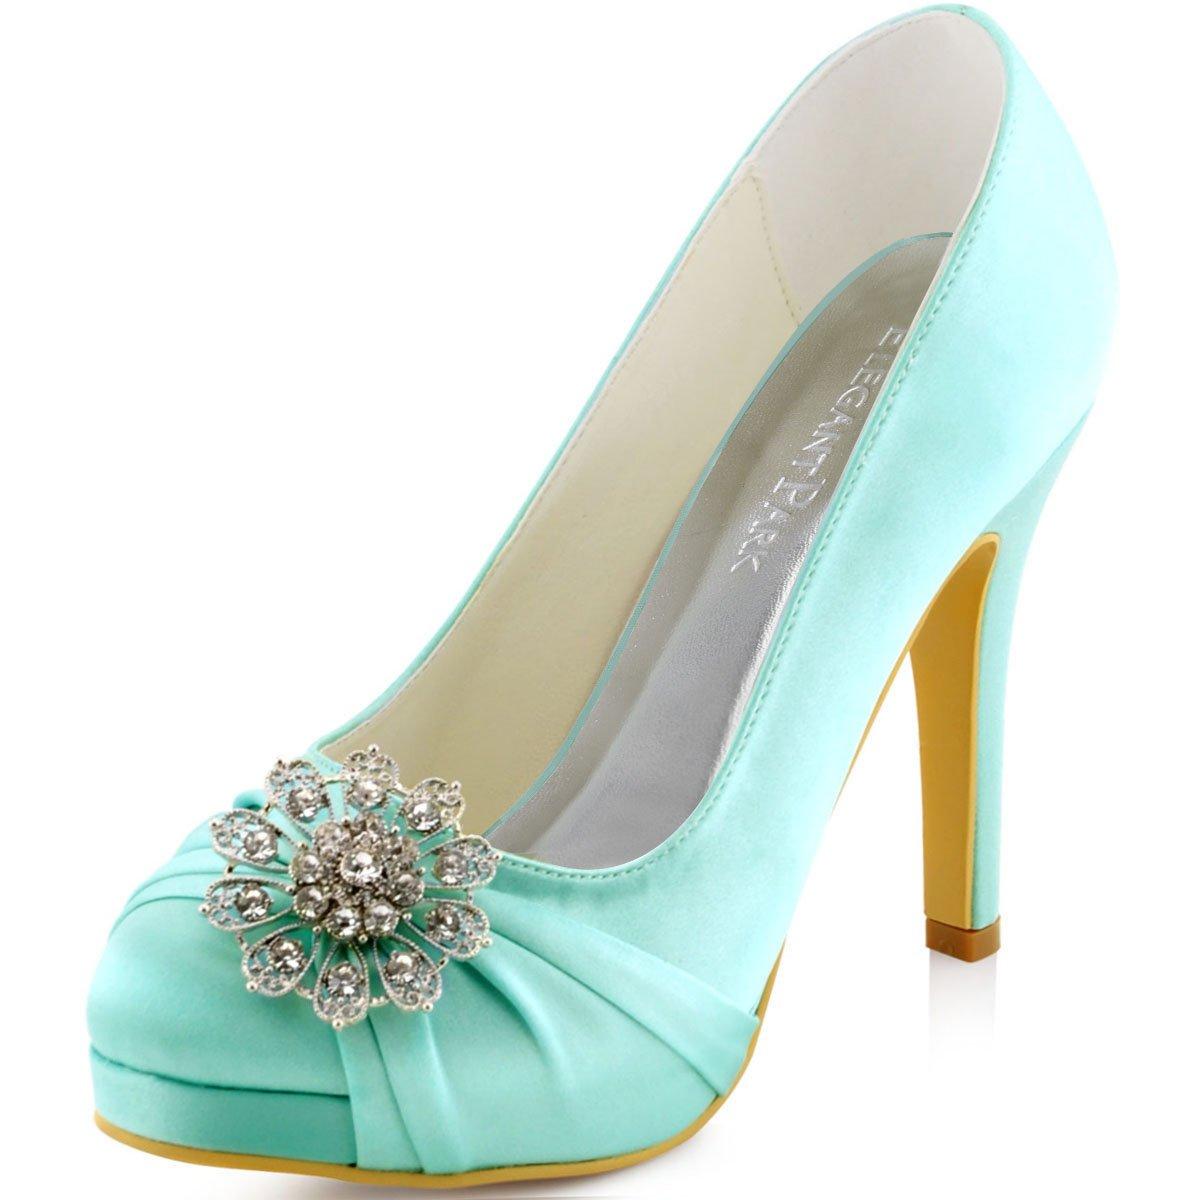 Elegantpark EP2015-PF Mujeres Bombas Punta Cerrada Zapatos Plataforma Zapatos Tacón Alto Rhinestones Satén Wedding Party Zapatos Novia 38 EU|Menta